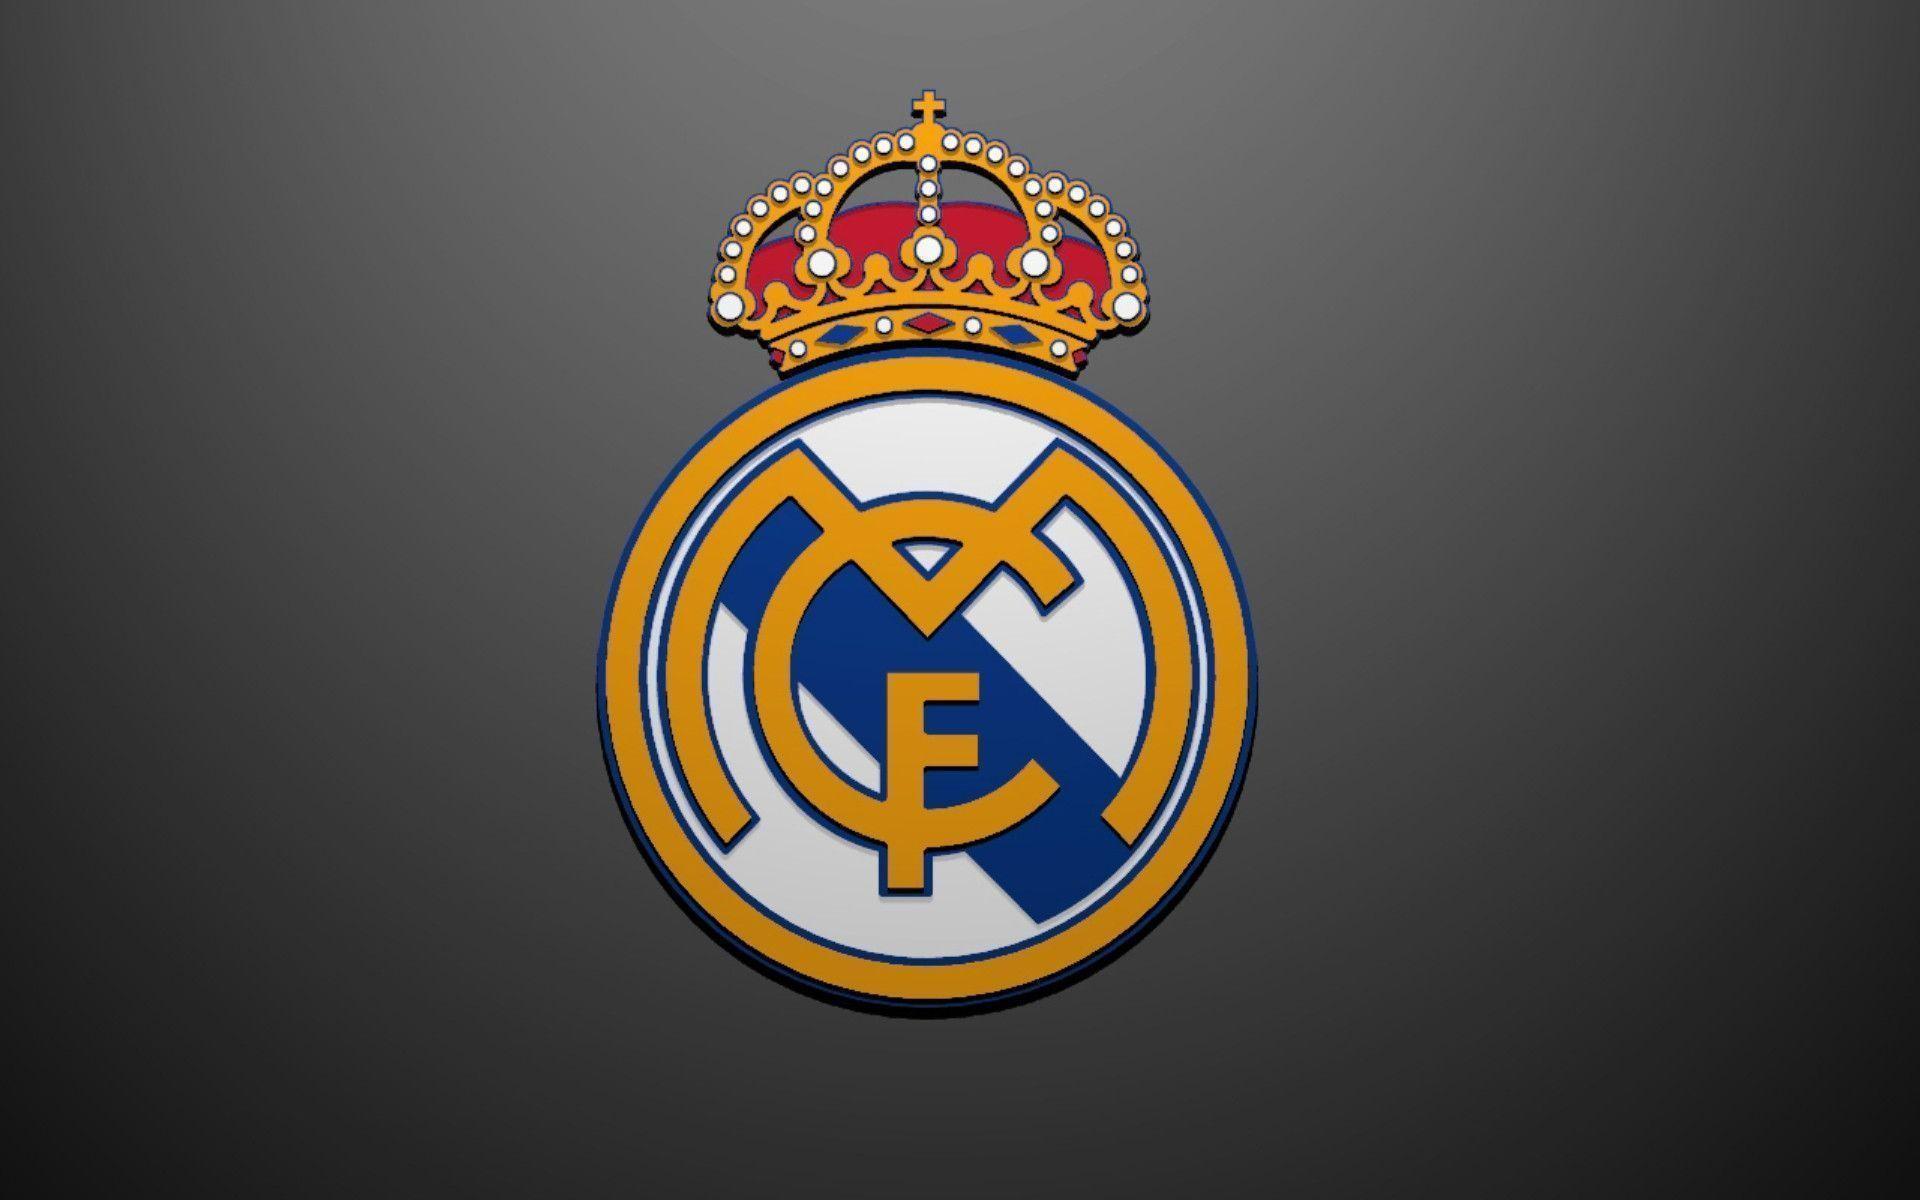 Res: 1920x1200, real madrid logo wallpaper #39108. Download. Real Madrid Logo Wallpapers ...